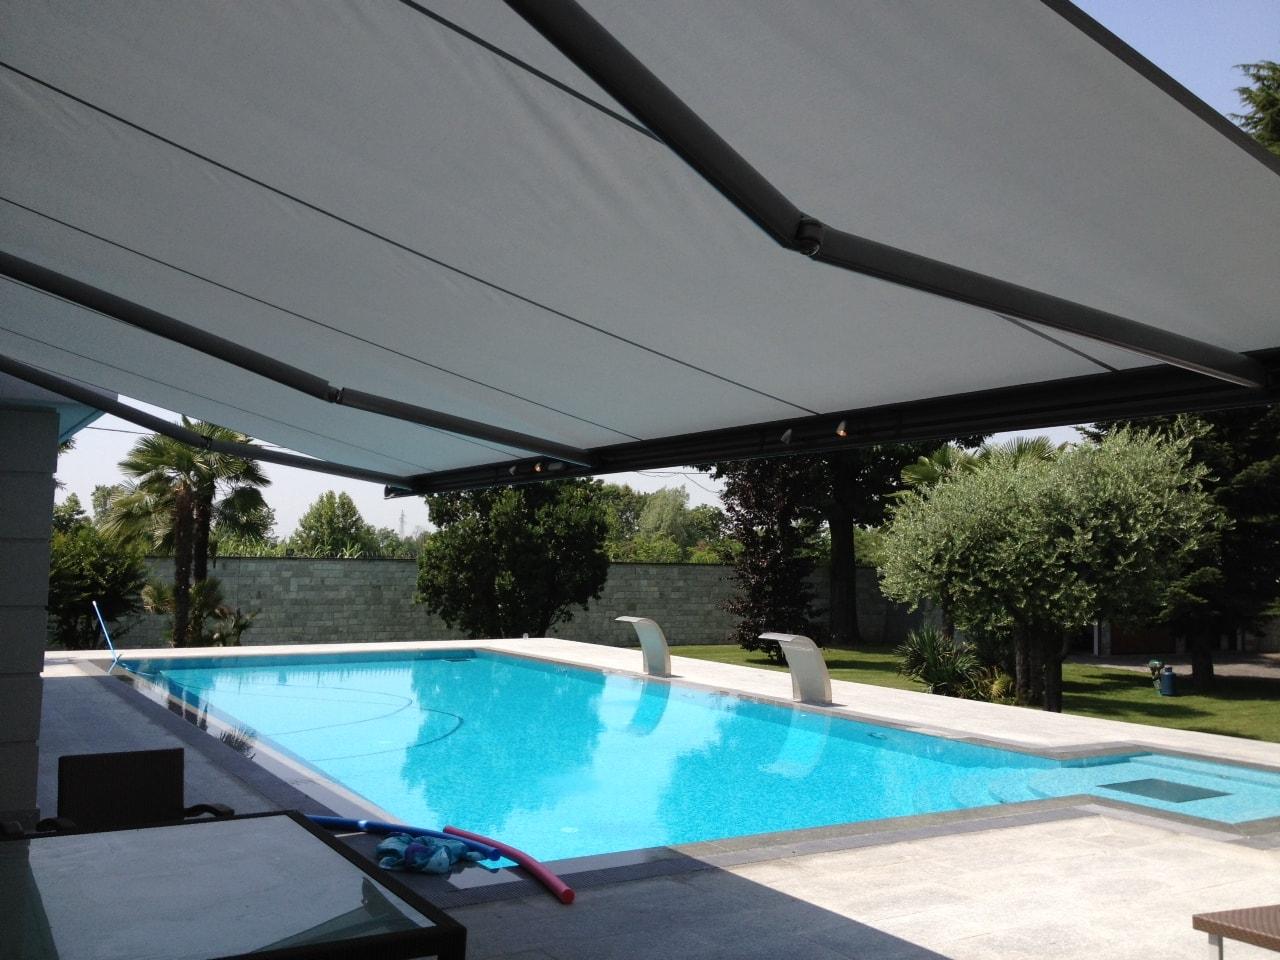 tende-markilux-per-piscina